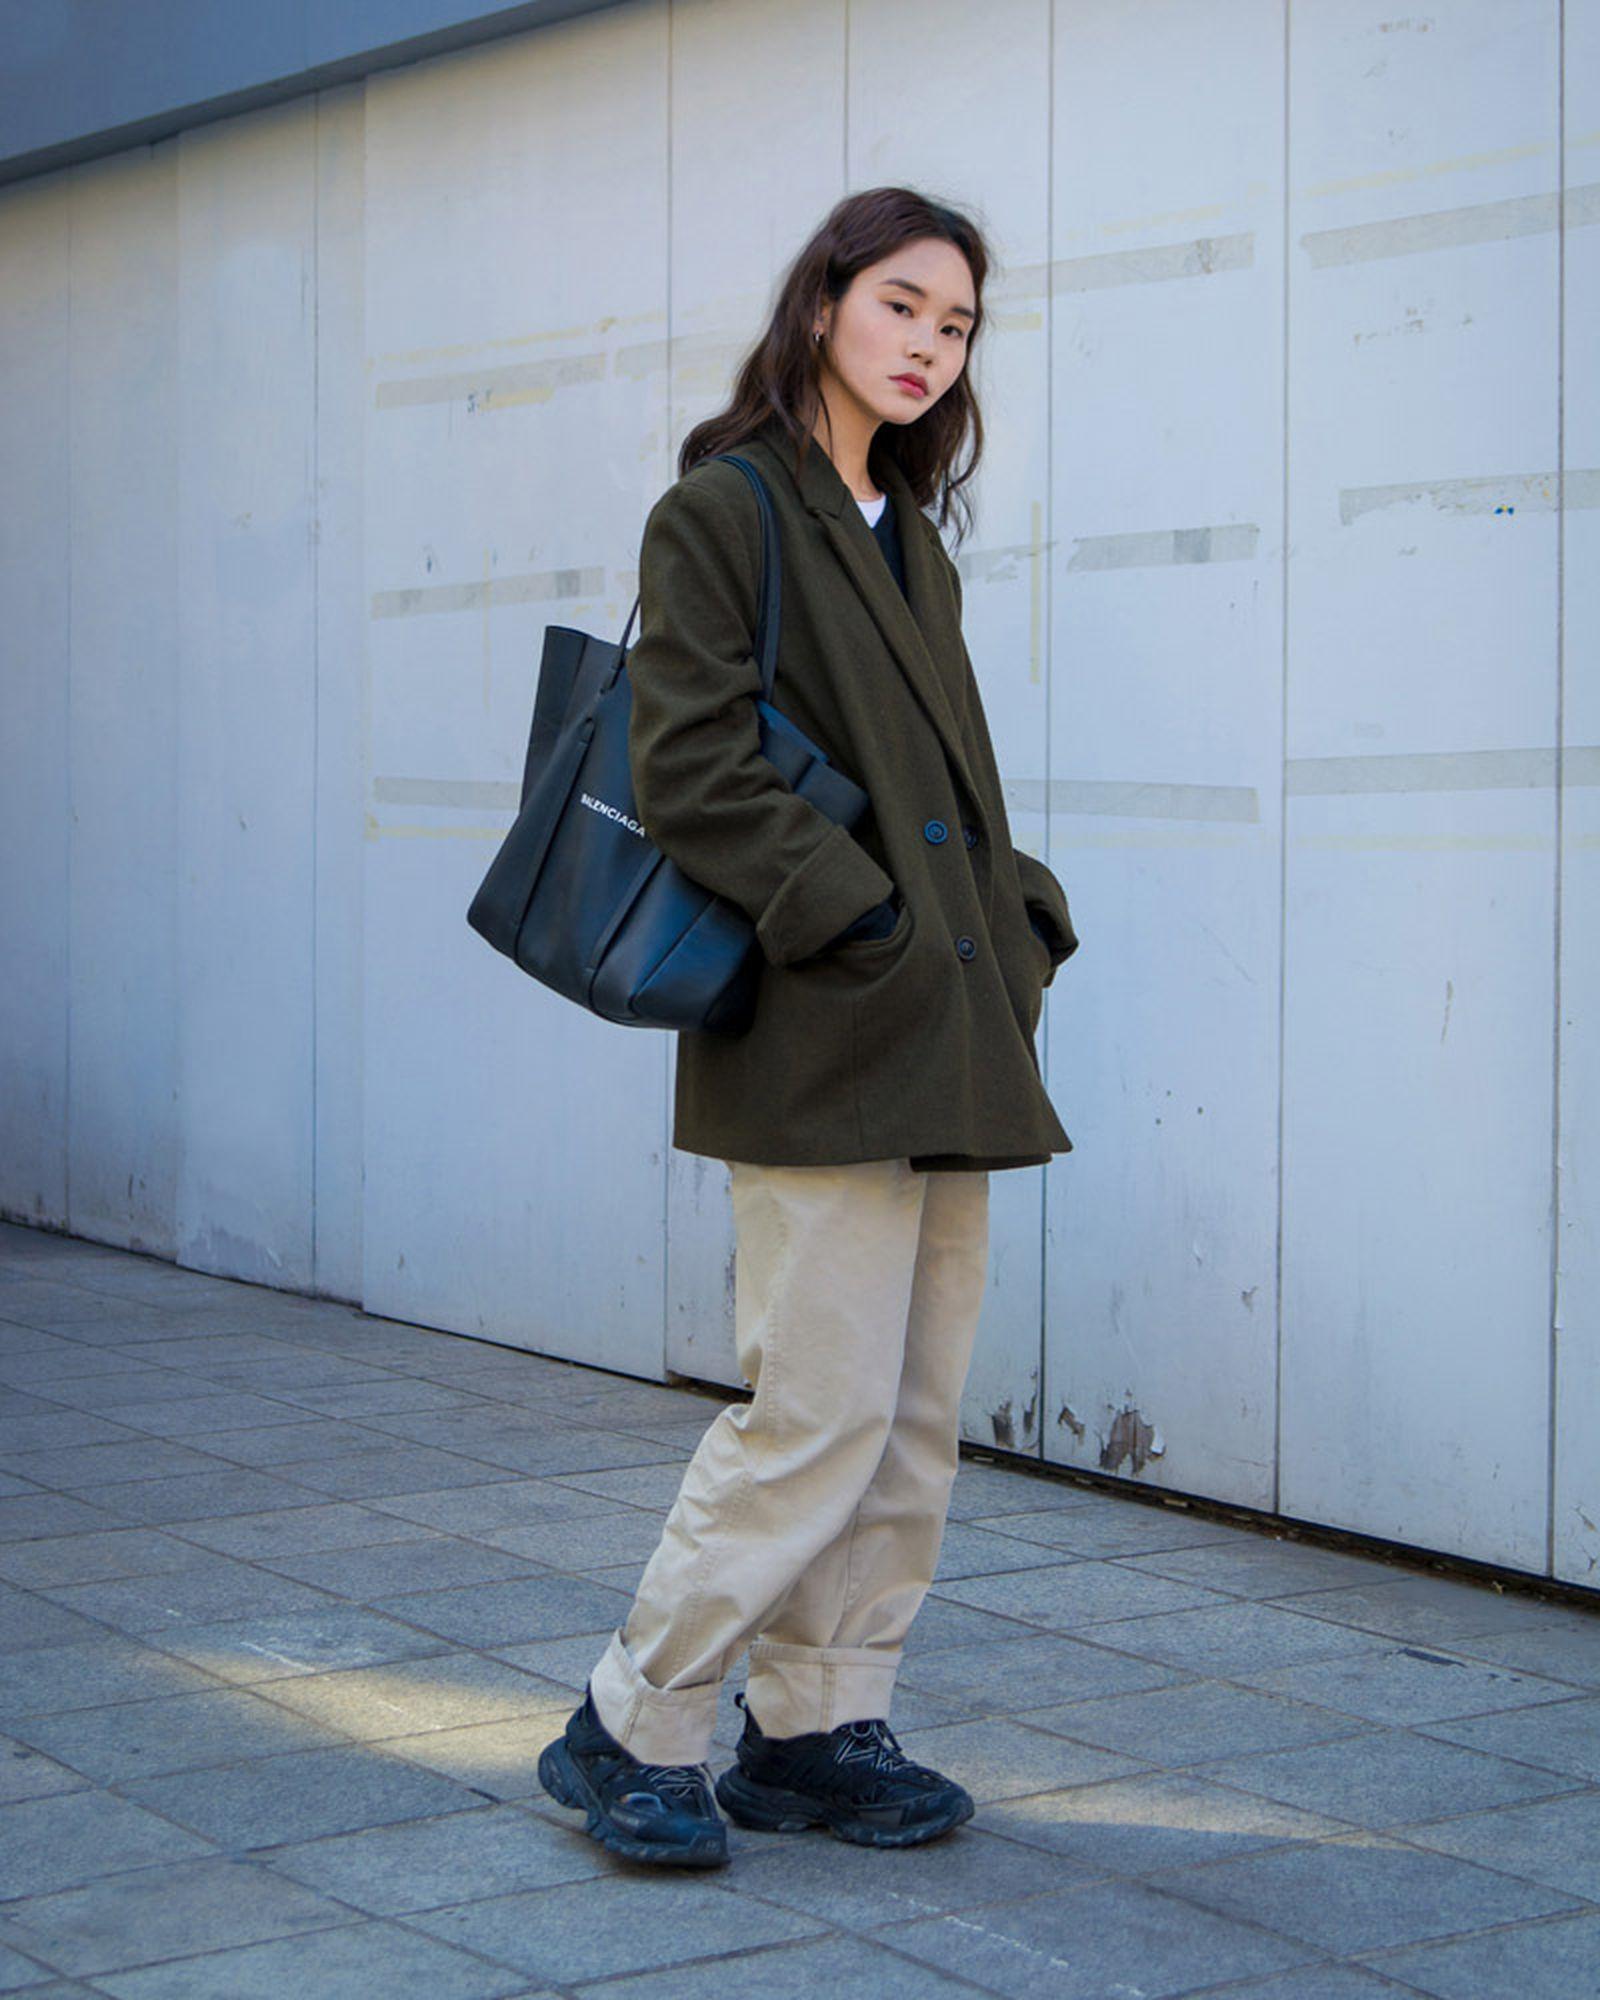 2019 Streetstyle Seoul April DanielLuna 09